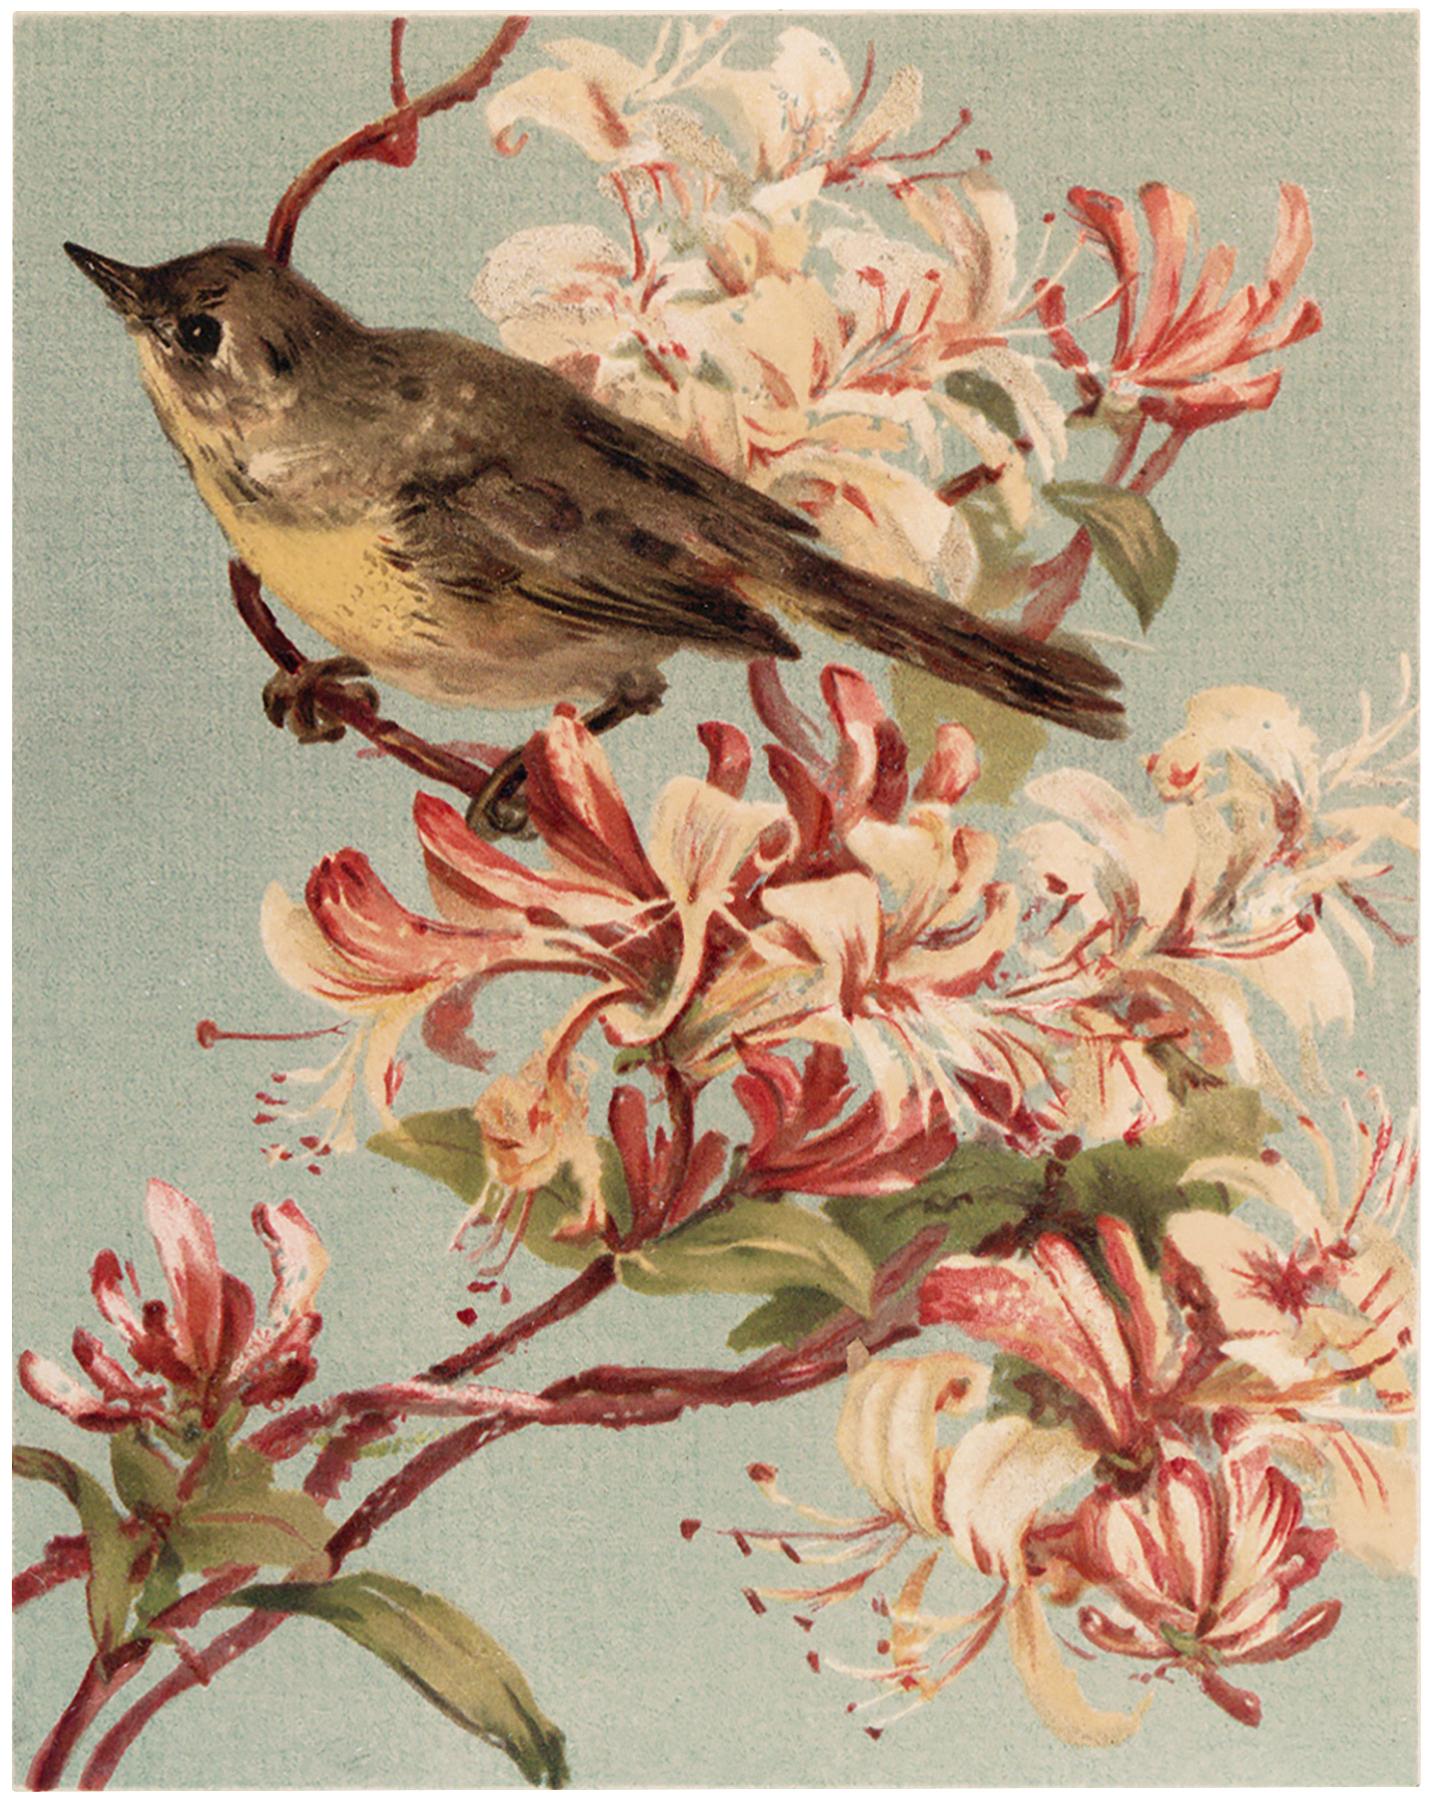 Vintage Bird Pink Flowers Image